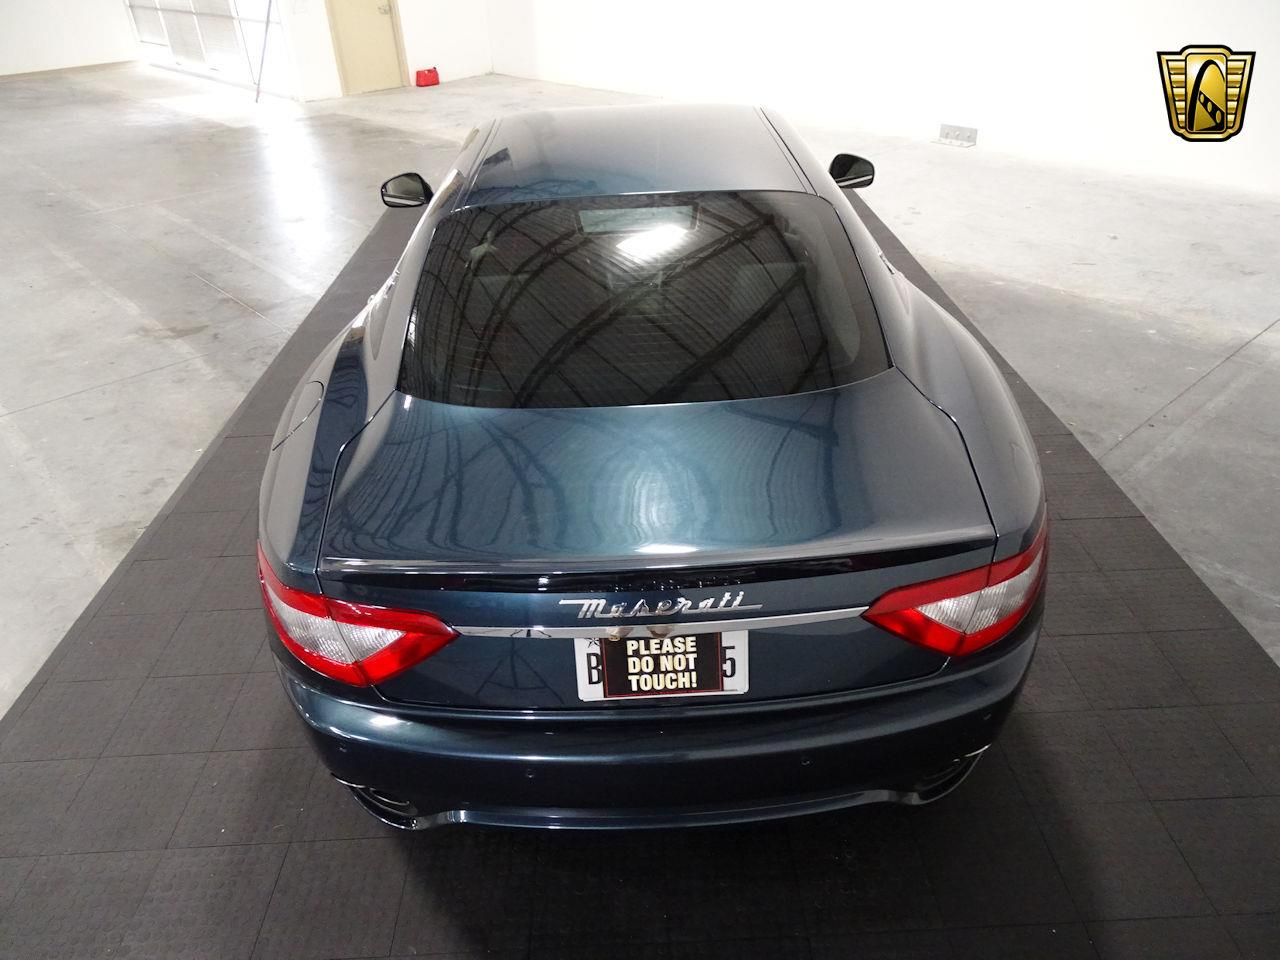 Large Picture of 2008 Maserati GranTurismo located in Texas - MO4H